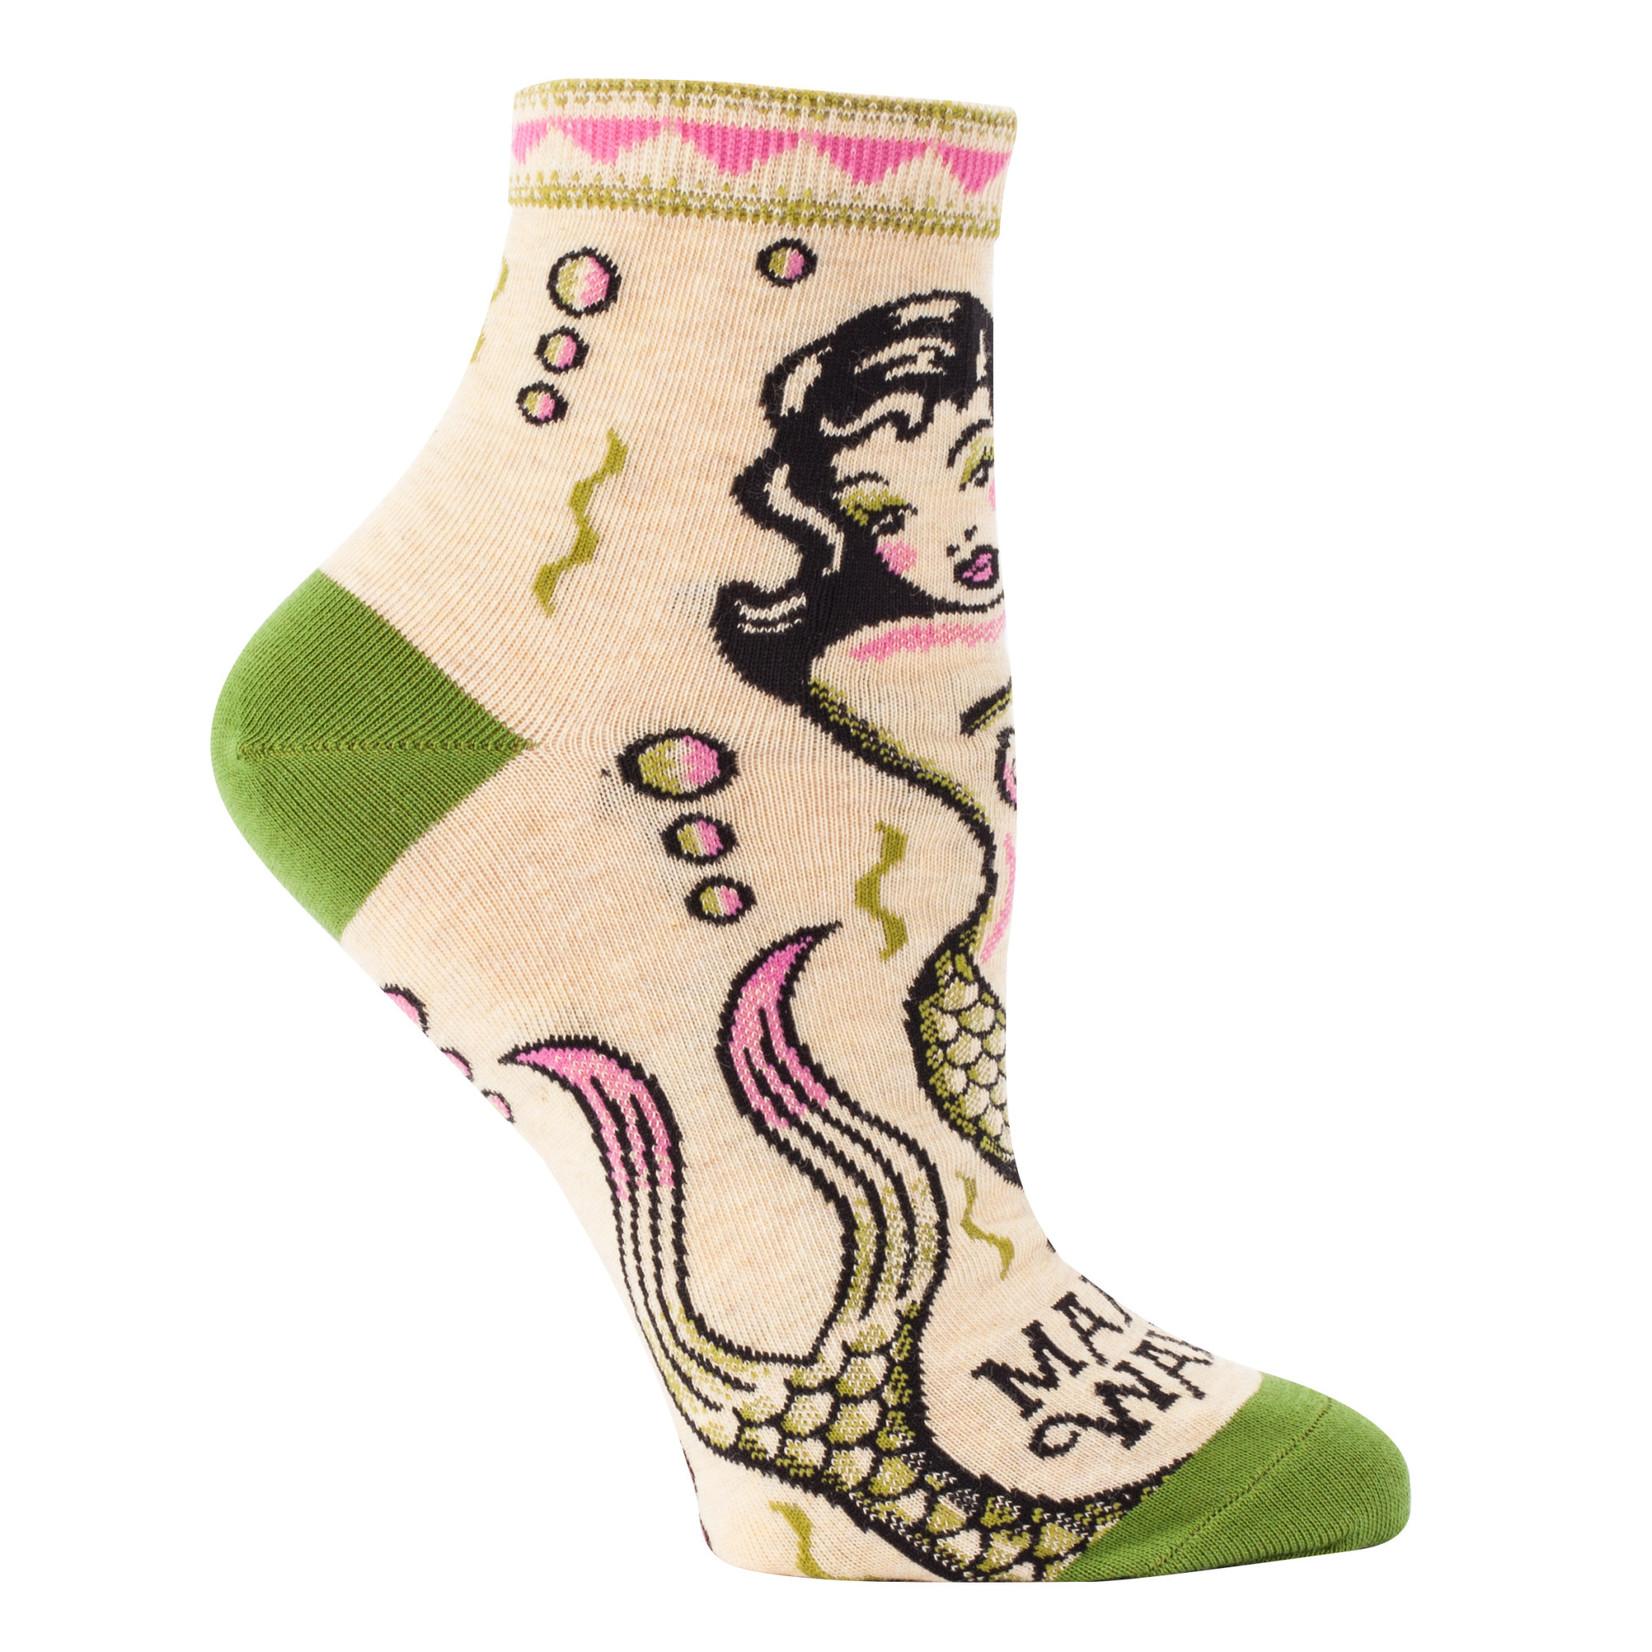 Blue Q Womens Ankle Socks - Makin Waves